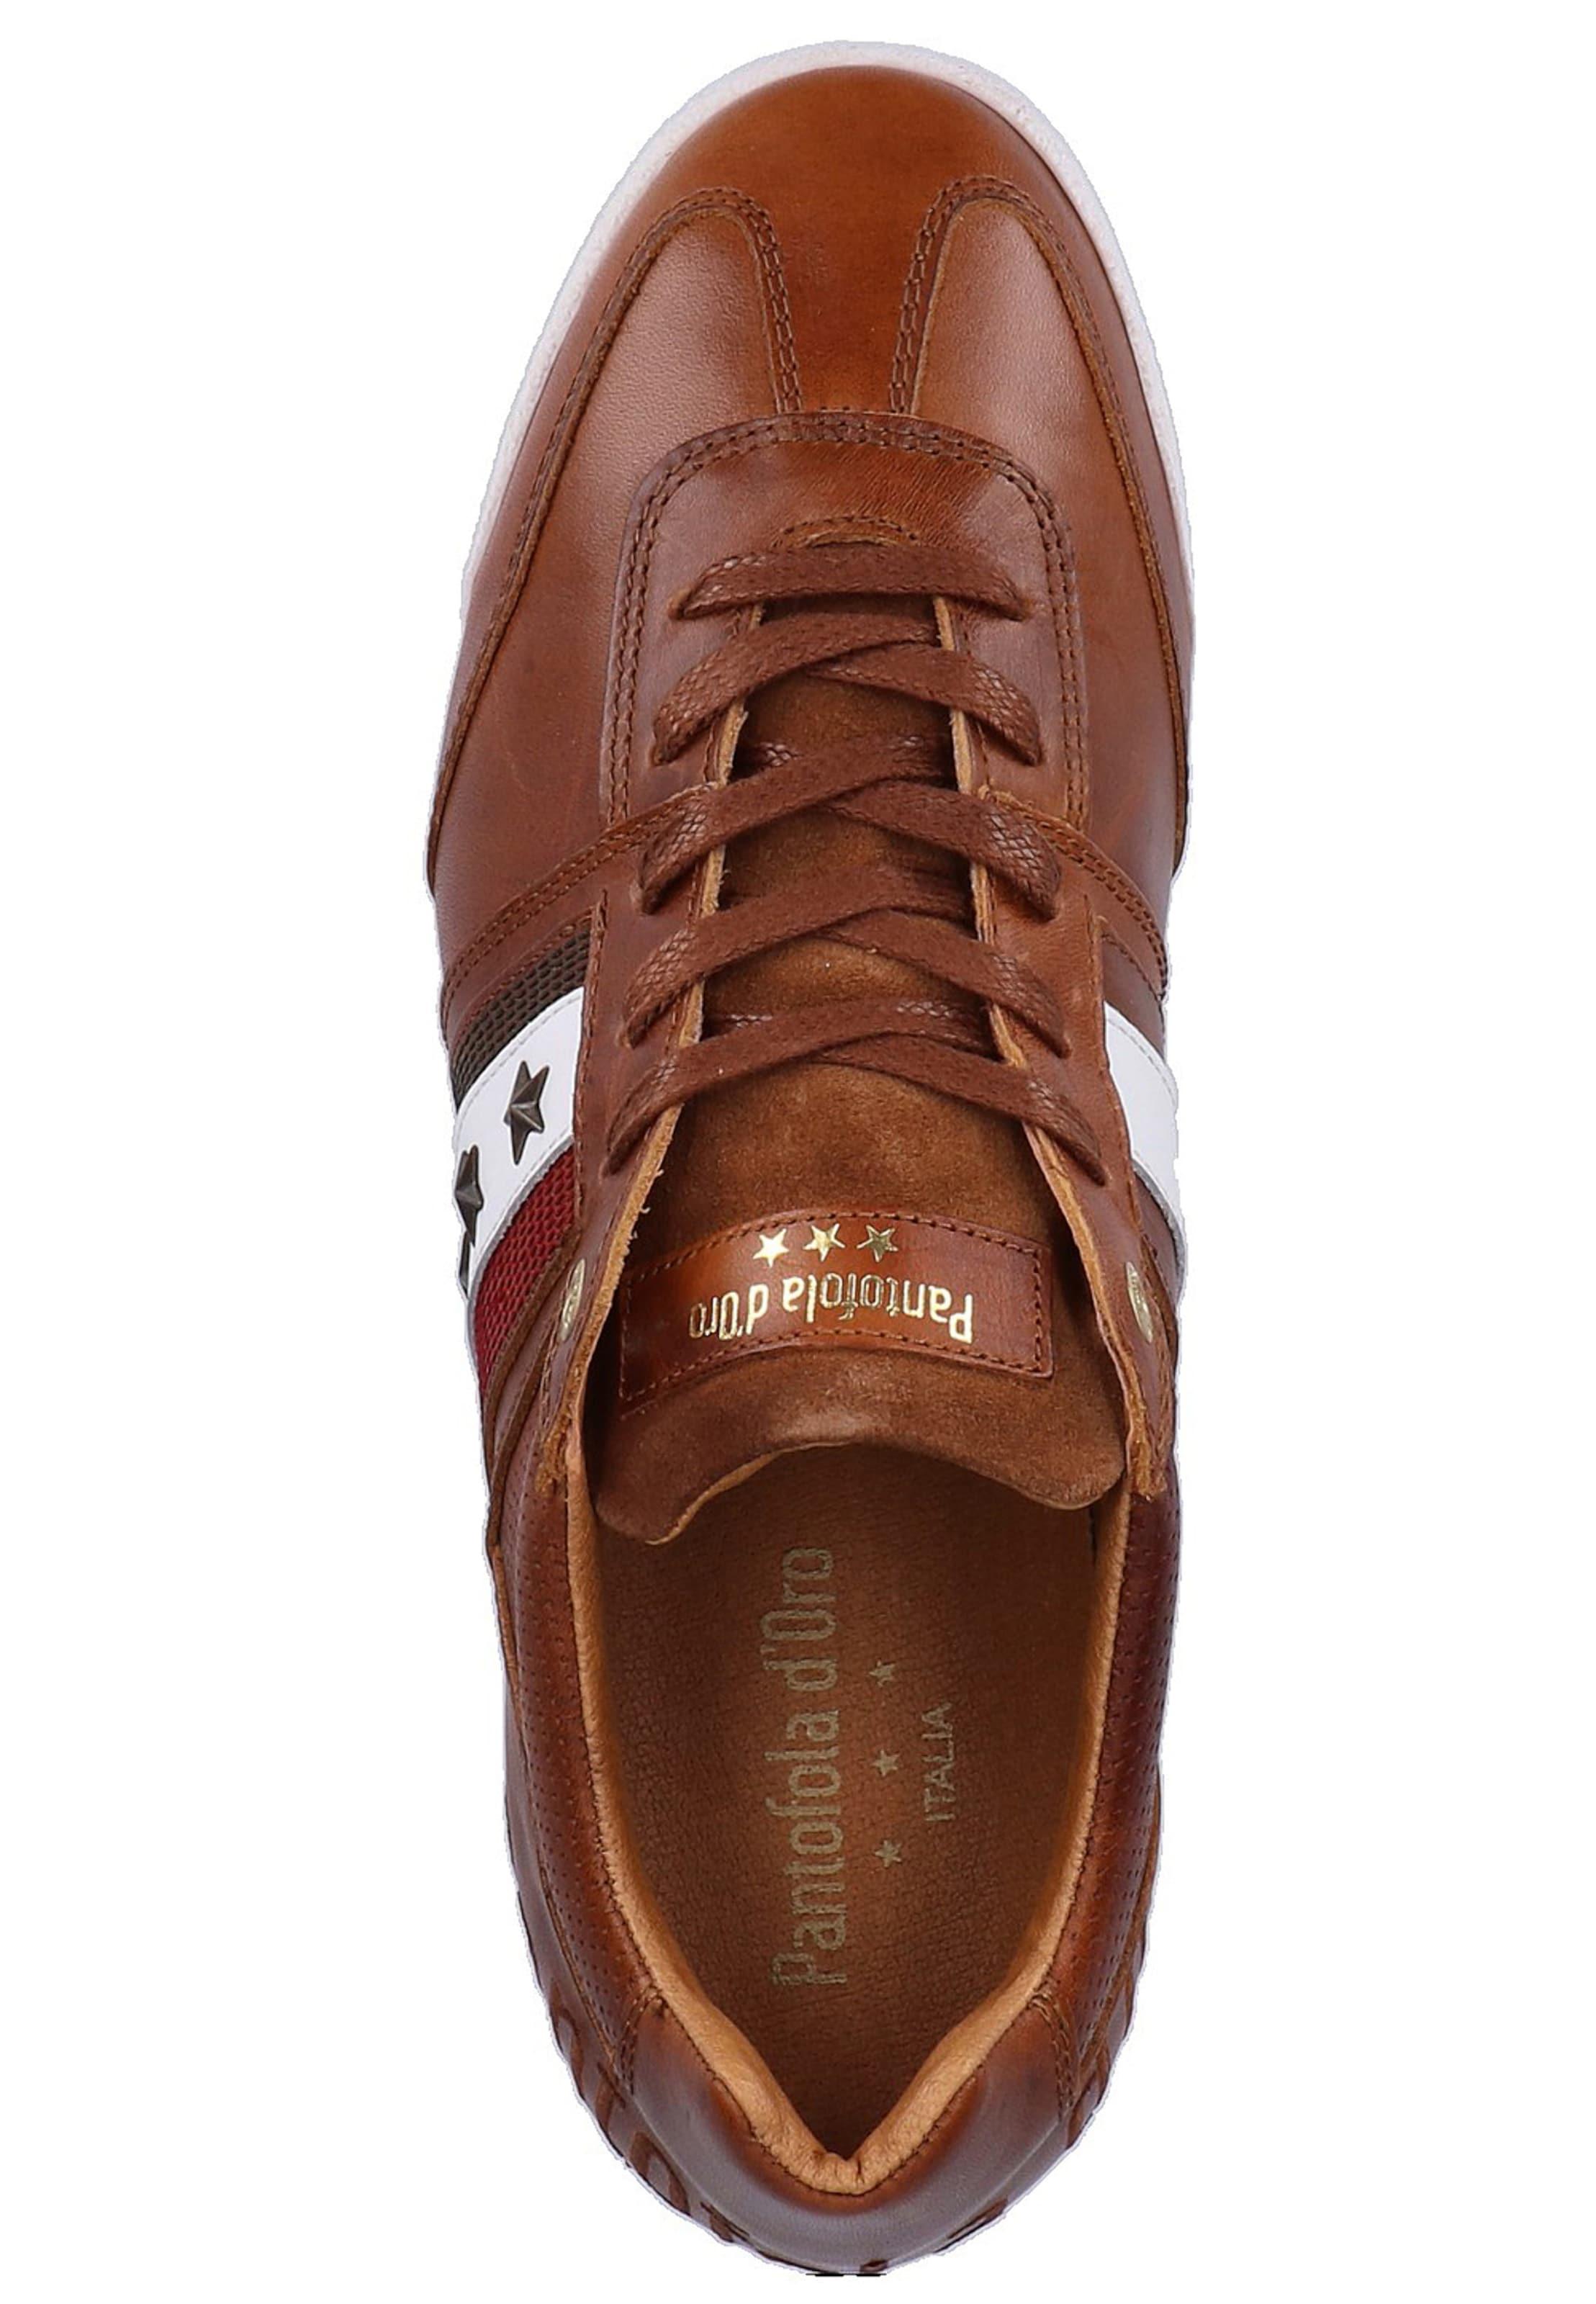 D'oro Pantofola Sneaker D'oro BraunWeiß In BraunWeiß Sneaker In Pantofola dsrotxBQhC